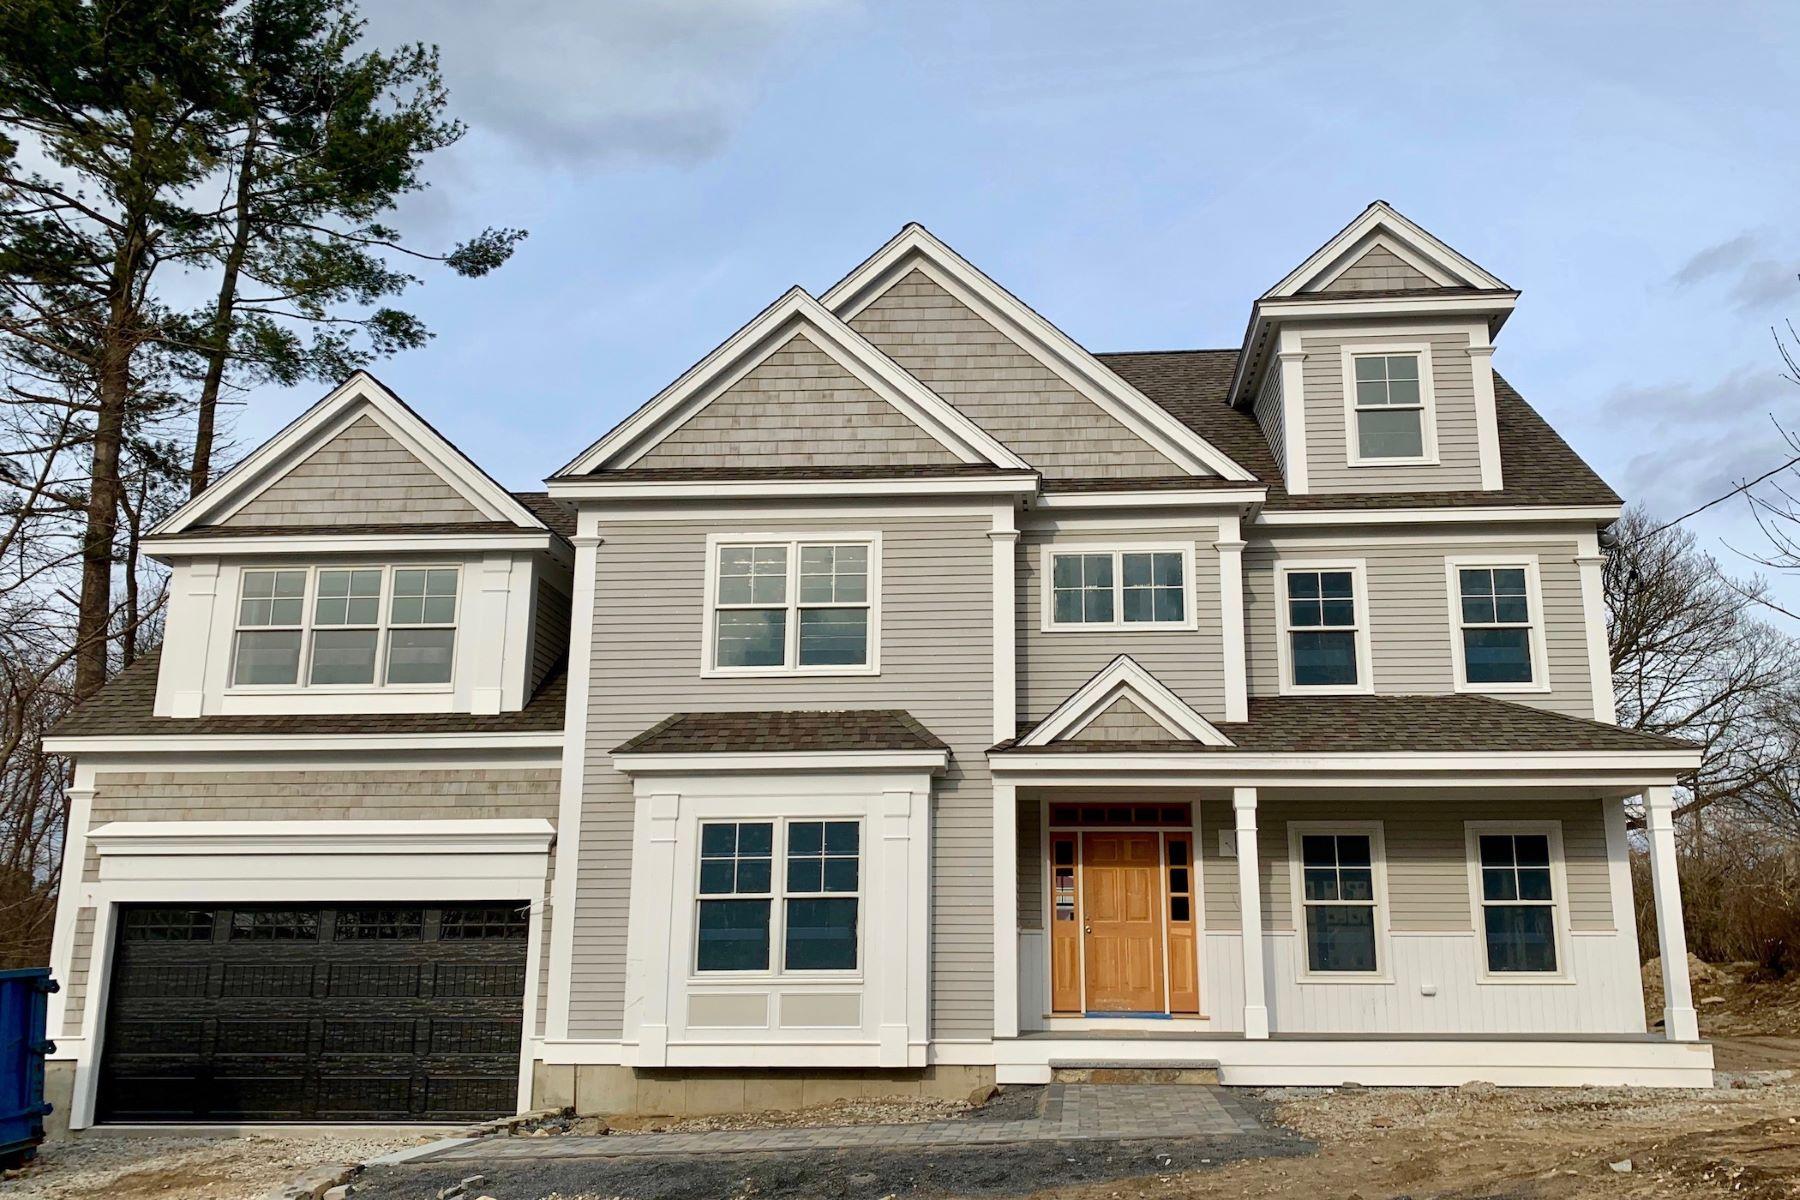 Single Family Home for Active at 121 Blake Road, Lexington 121 Blake Rd Lexington, Massachusetts 02420 United States